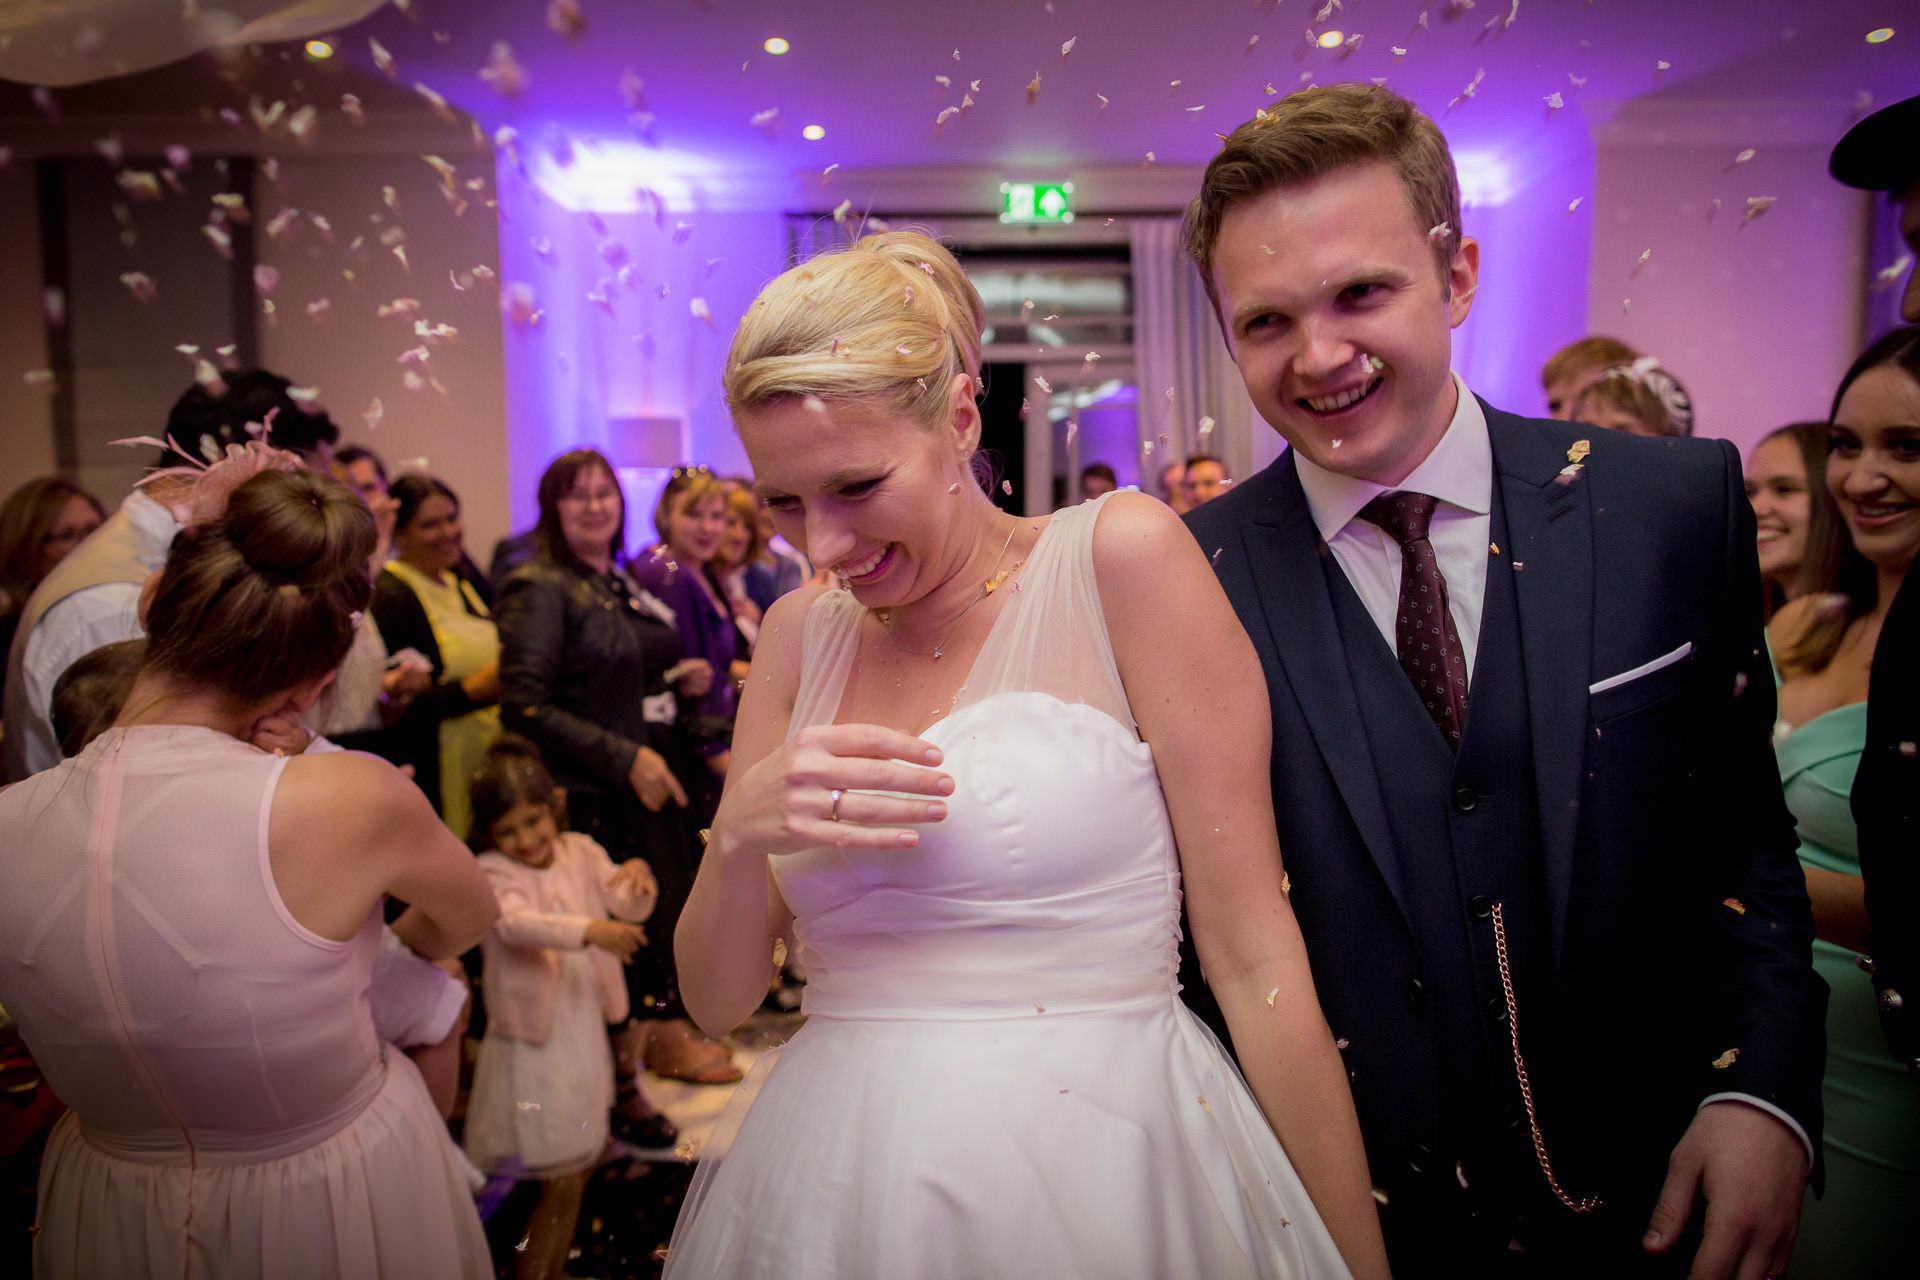 Wotton House wedding confetti shower